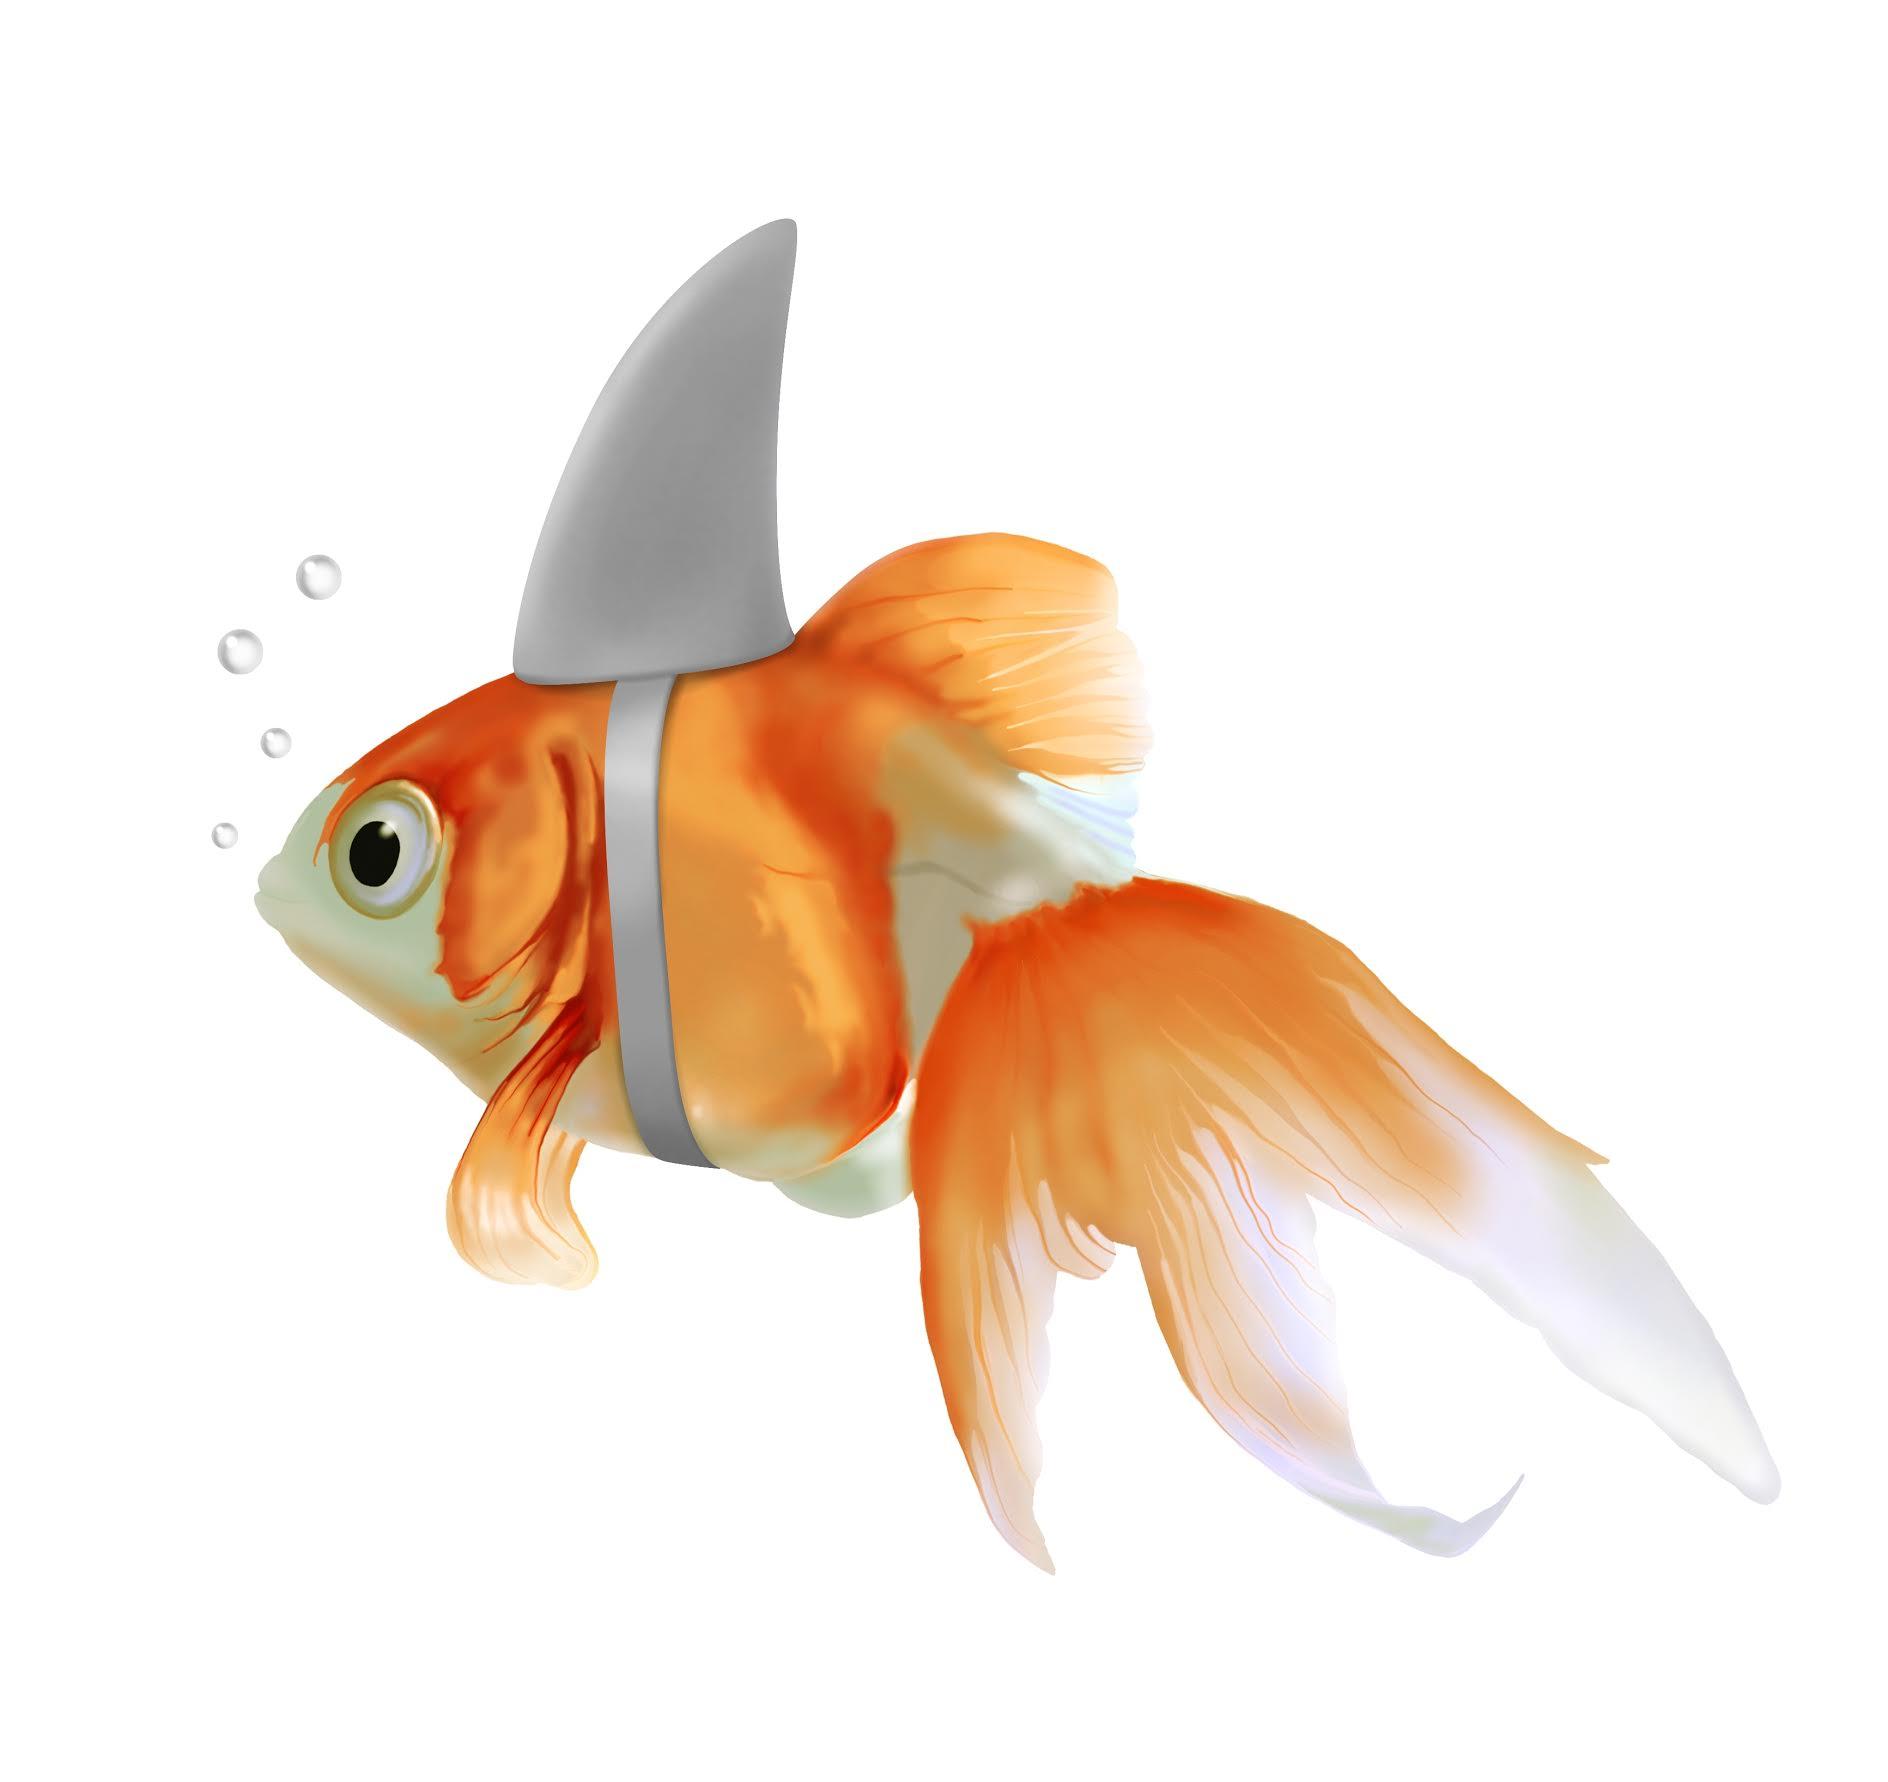 fish_shark.jpg